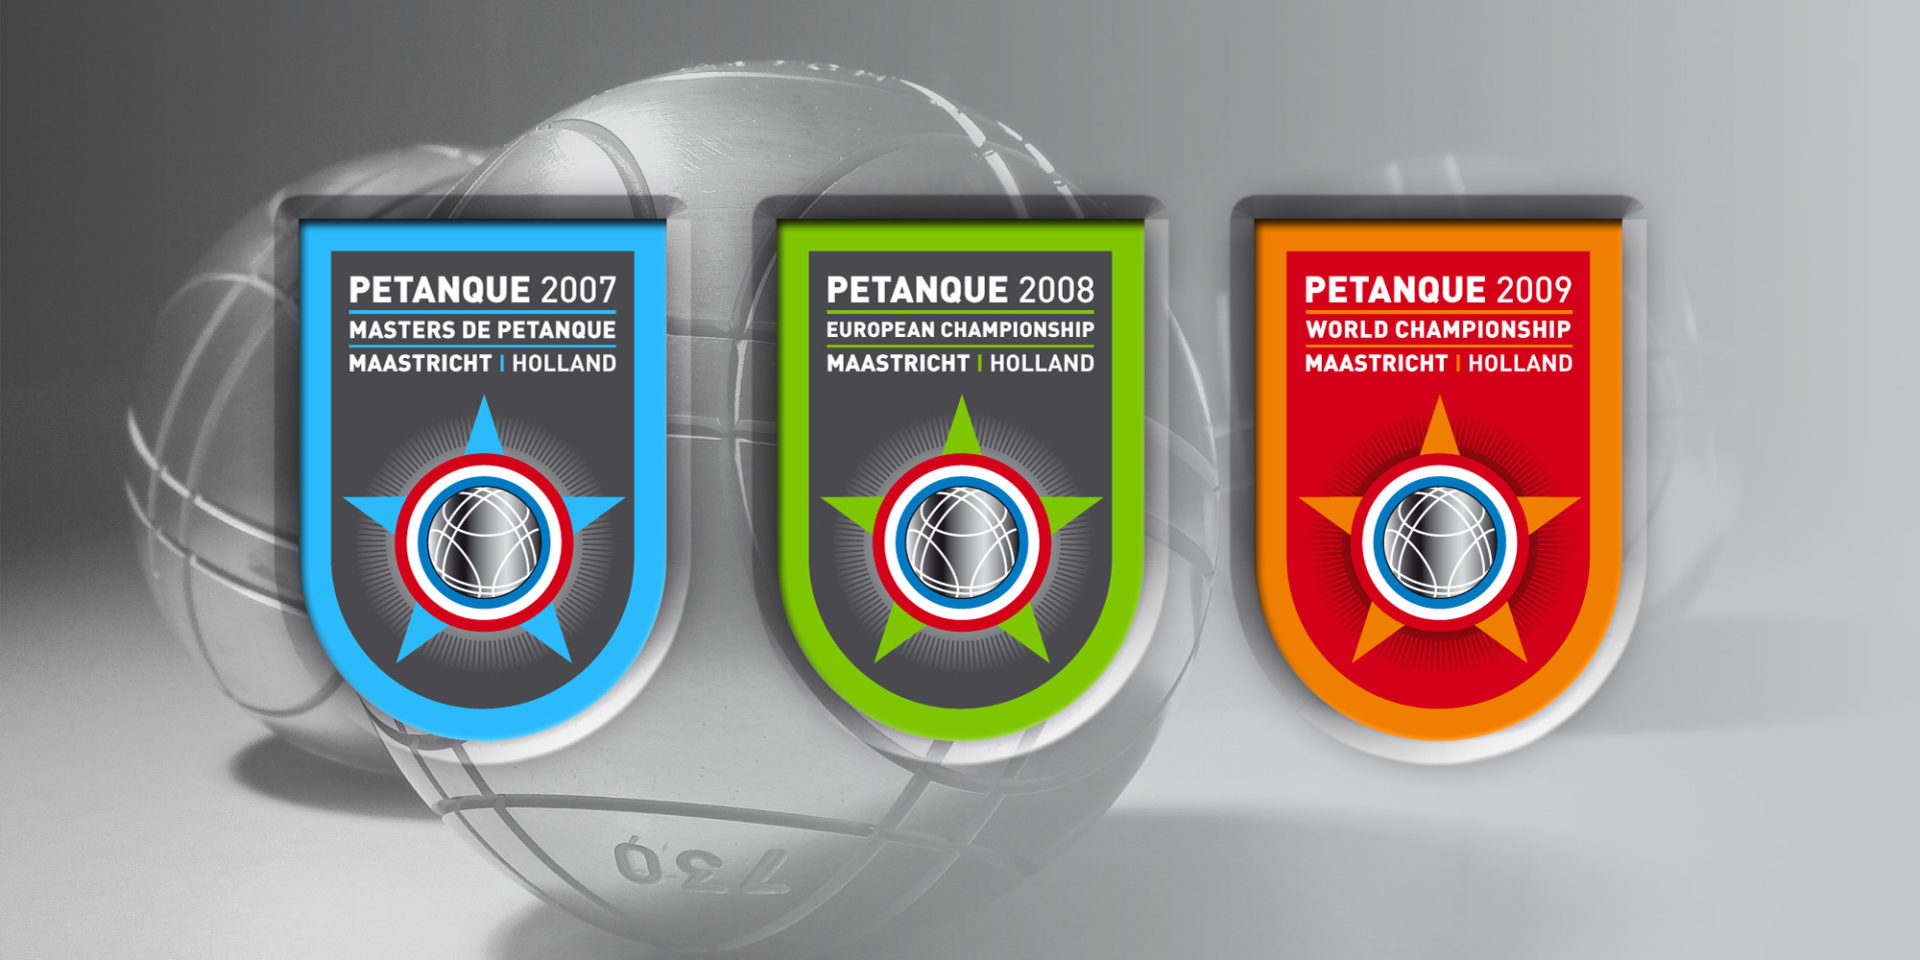 Petanque logo - Jeroen Borrenbergs)